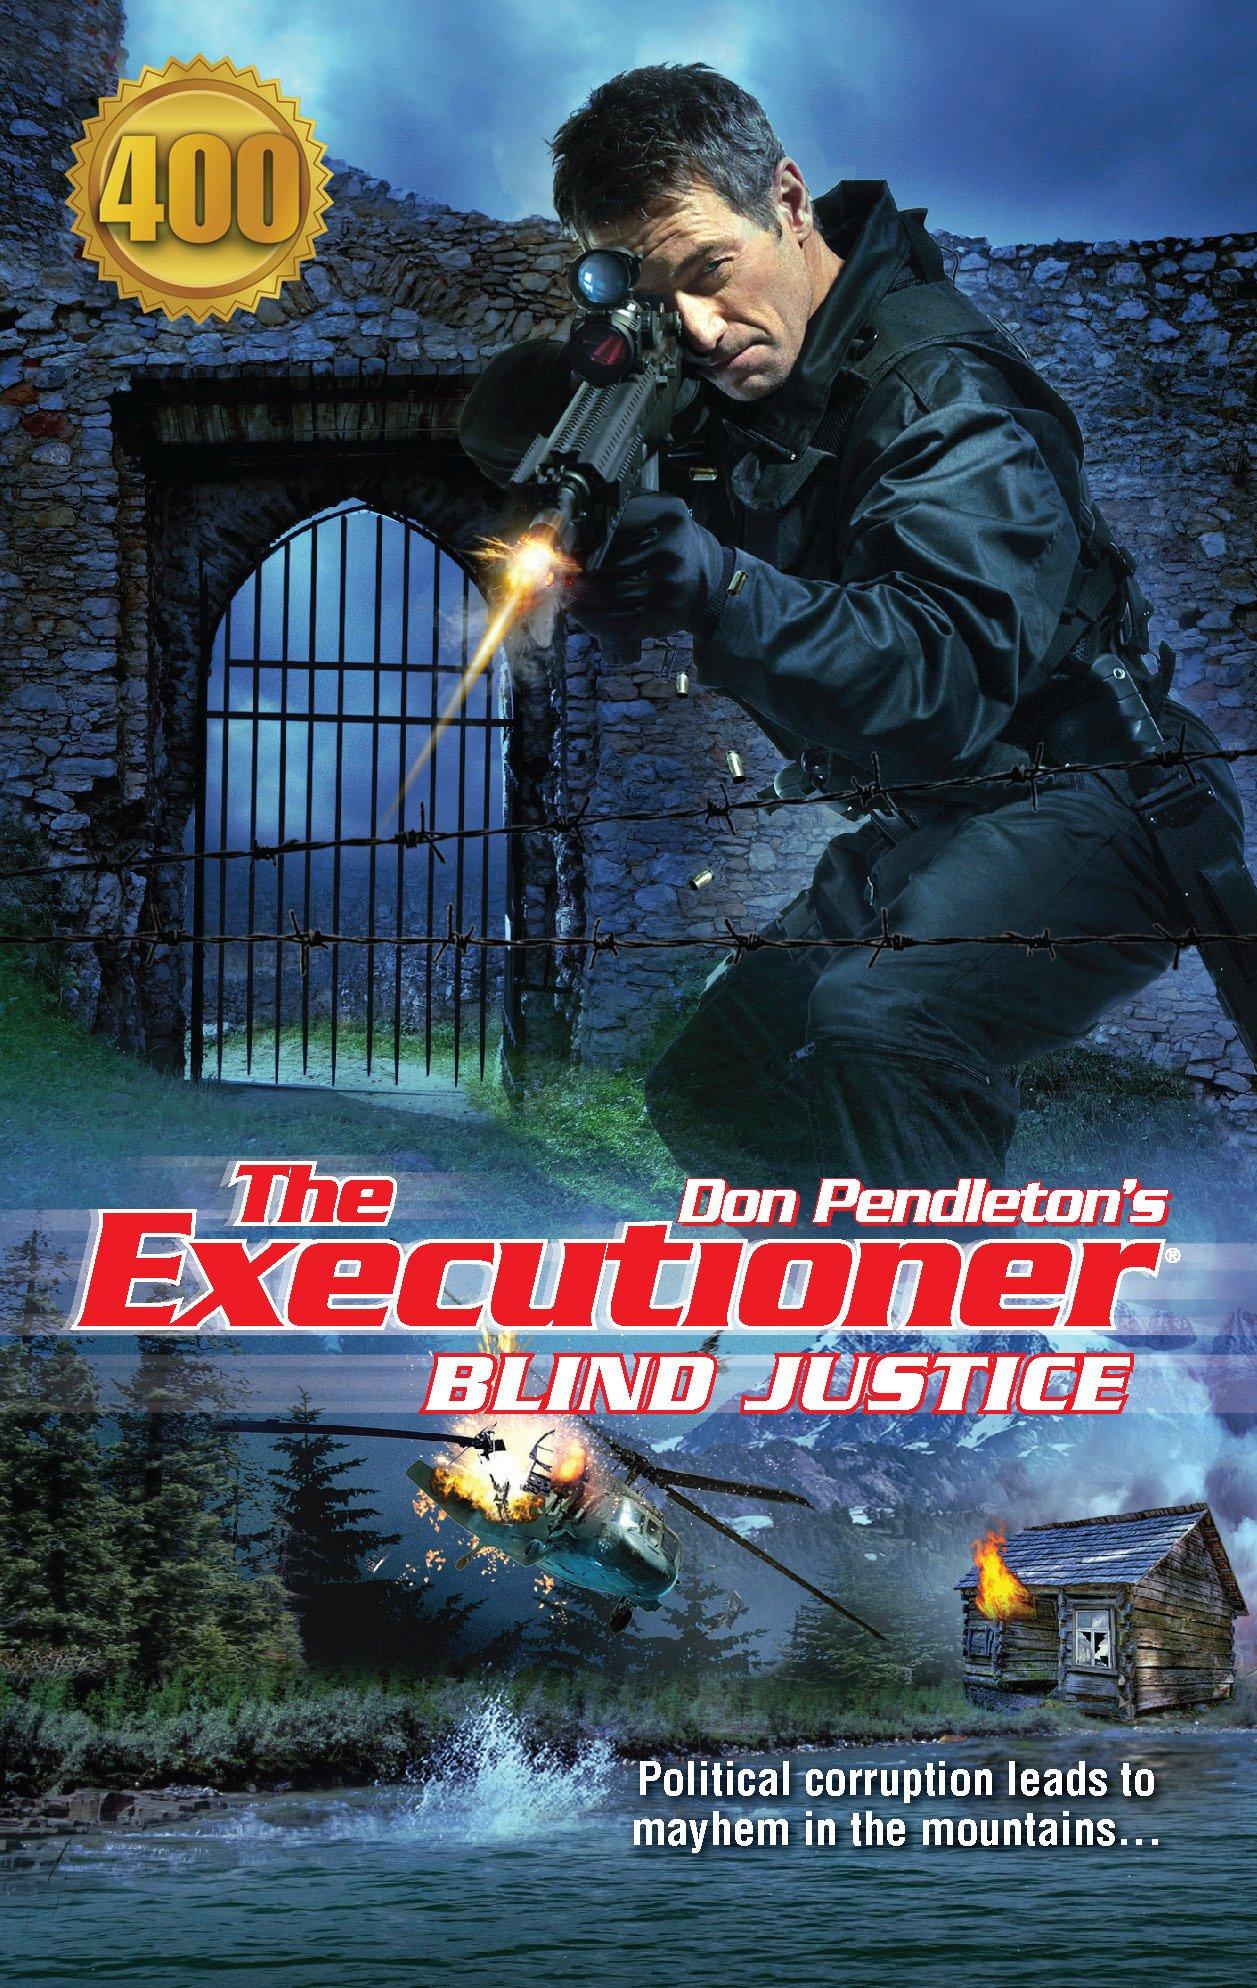 Amazon.com: Blind Justice (The Executioner #400) (9780373644001): Don  Pendleton: Books